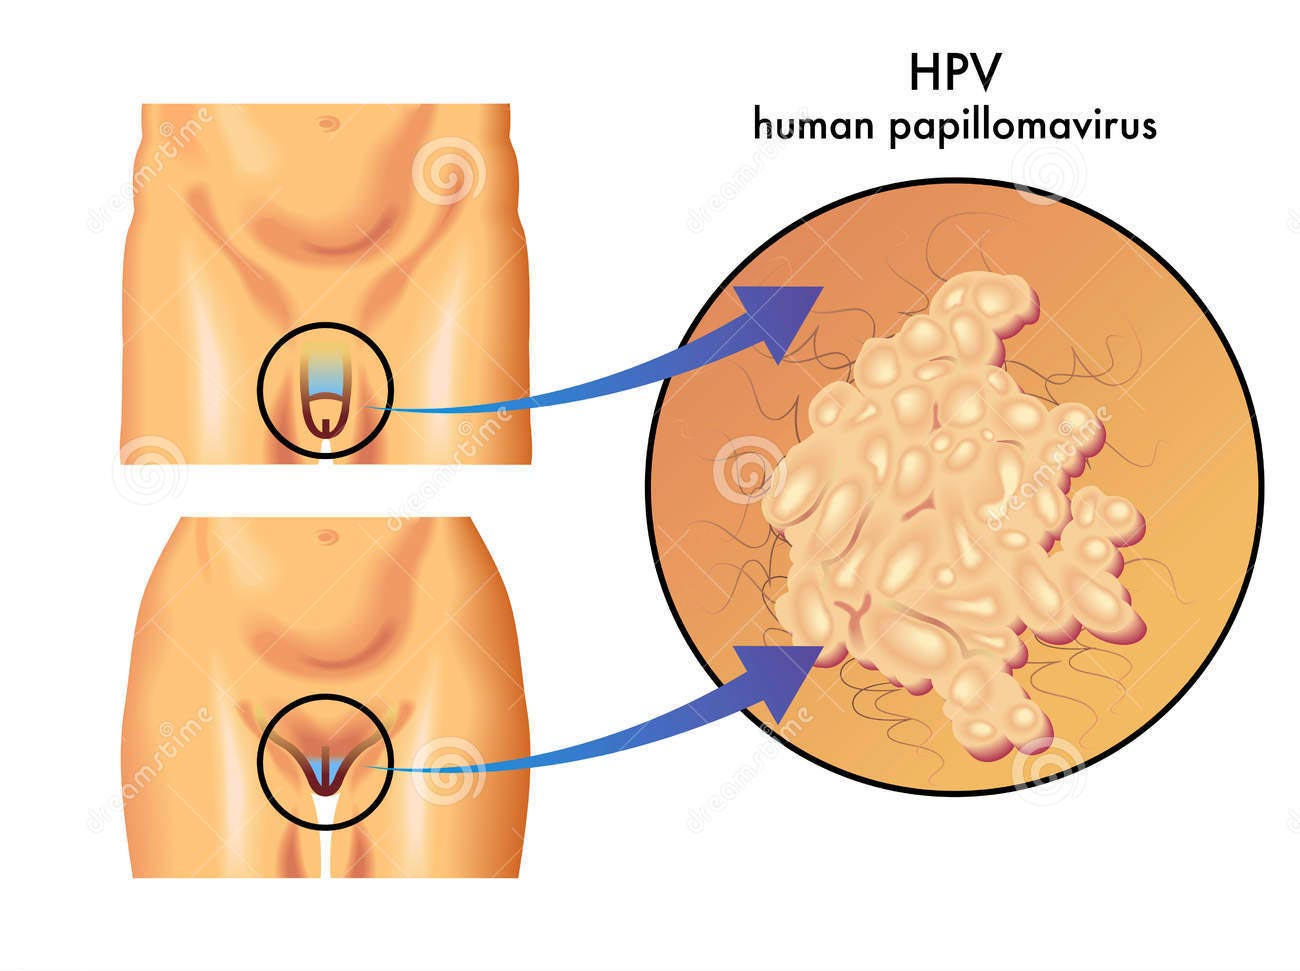 sintomi del papilloma virus nelle donne